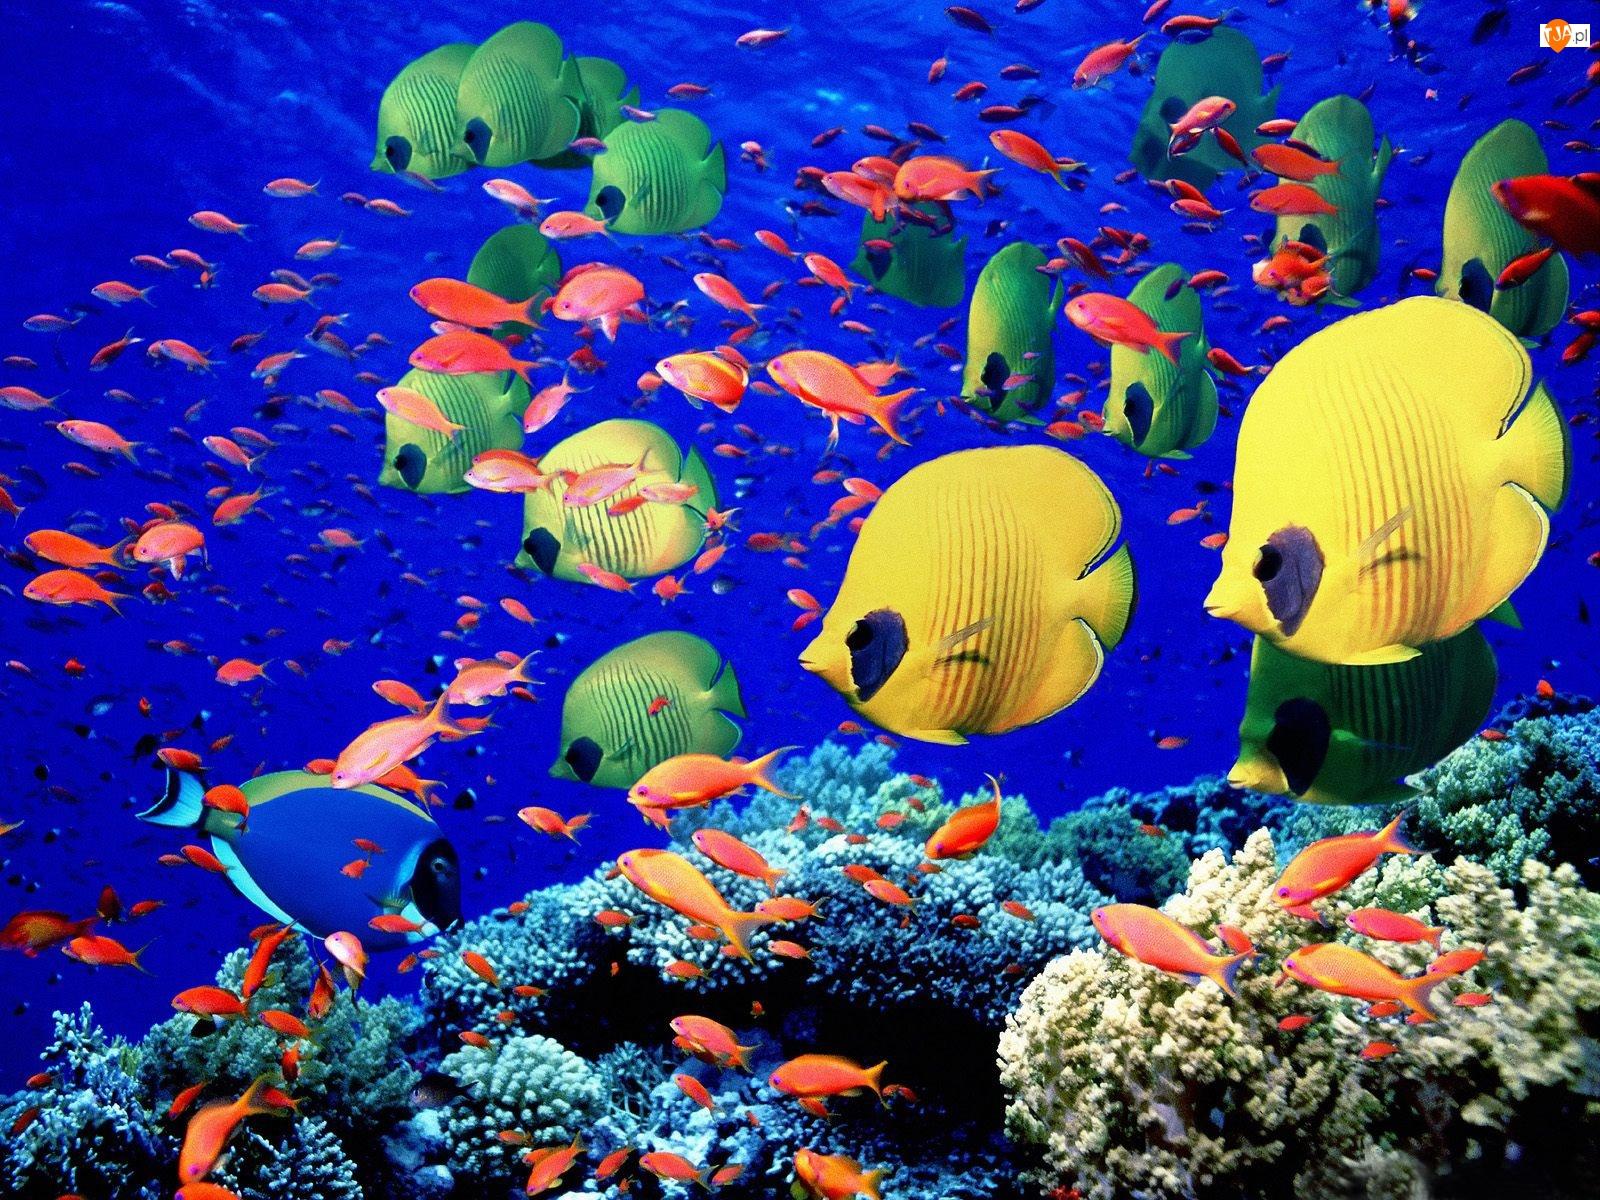 Rafa, Rybki, Ocean, Kolorowe